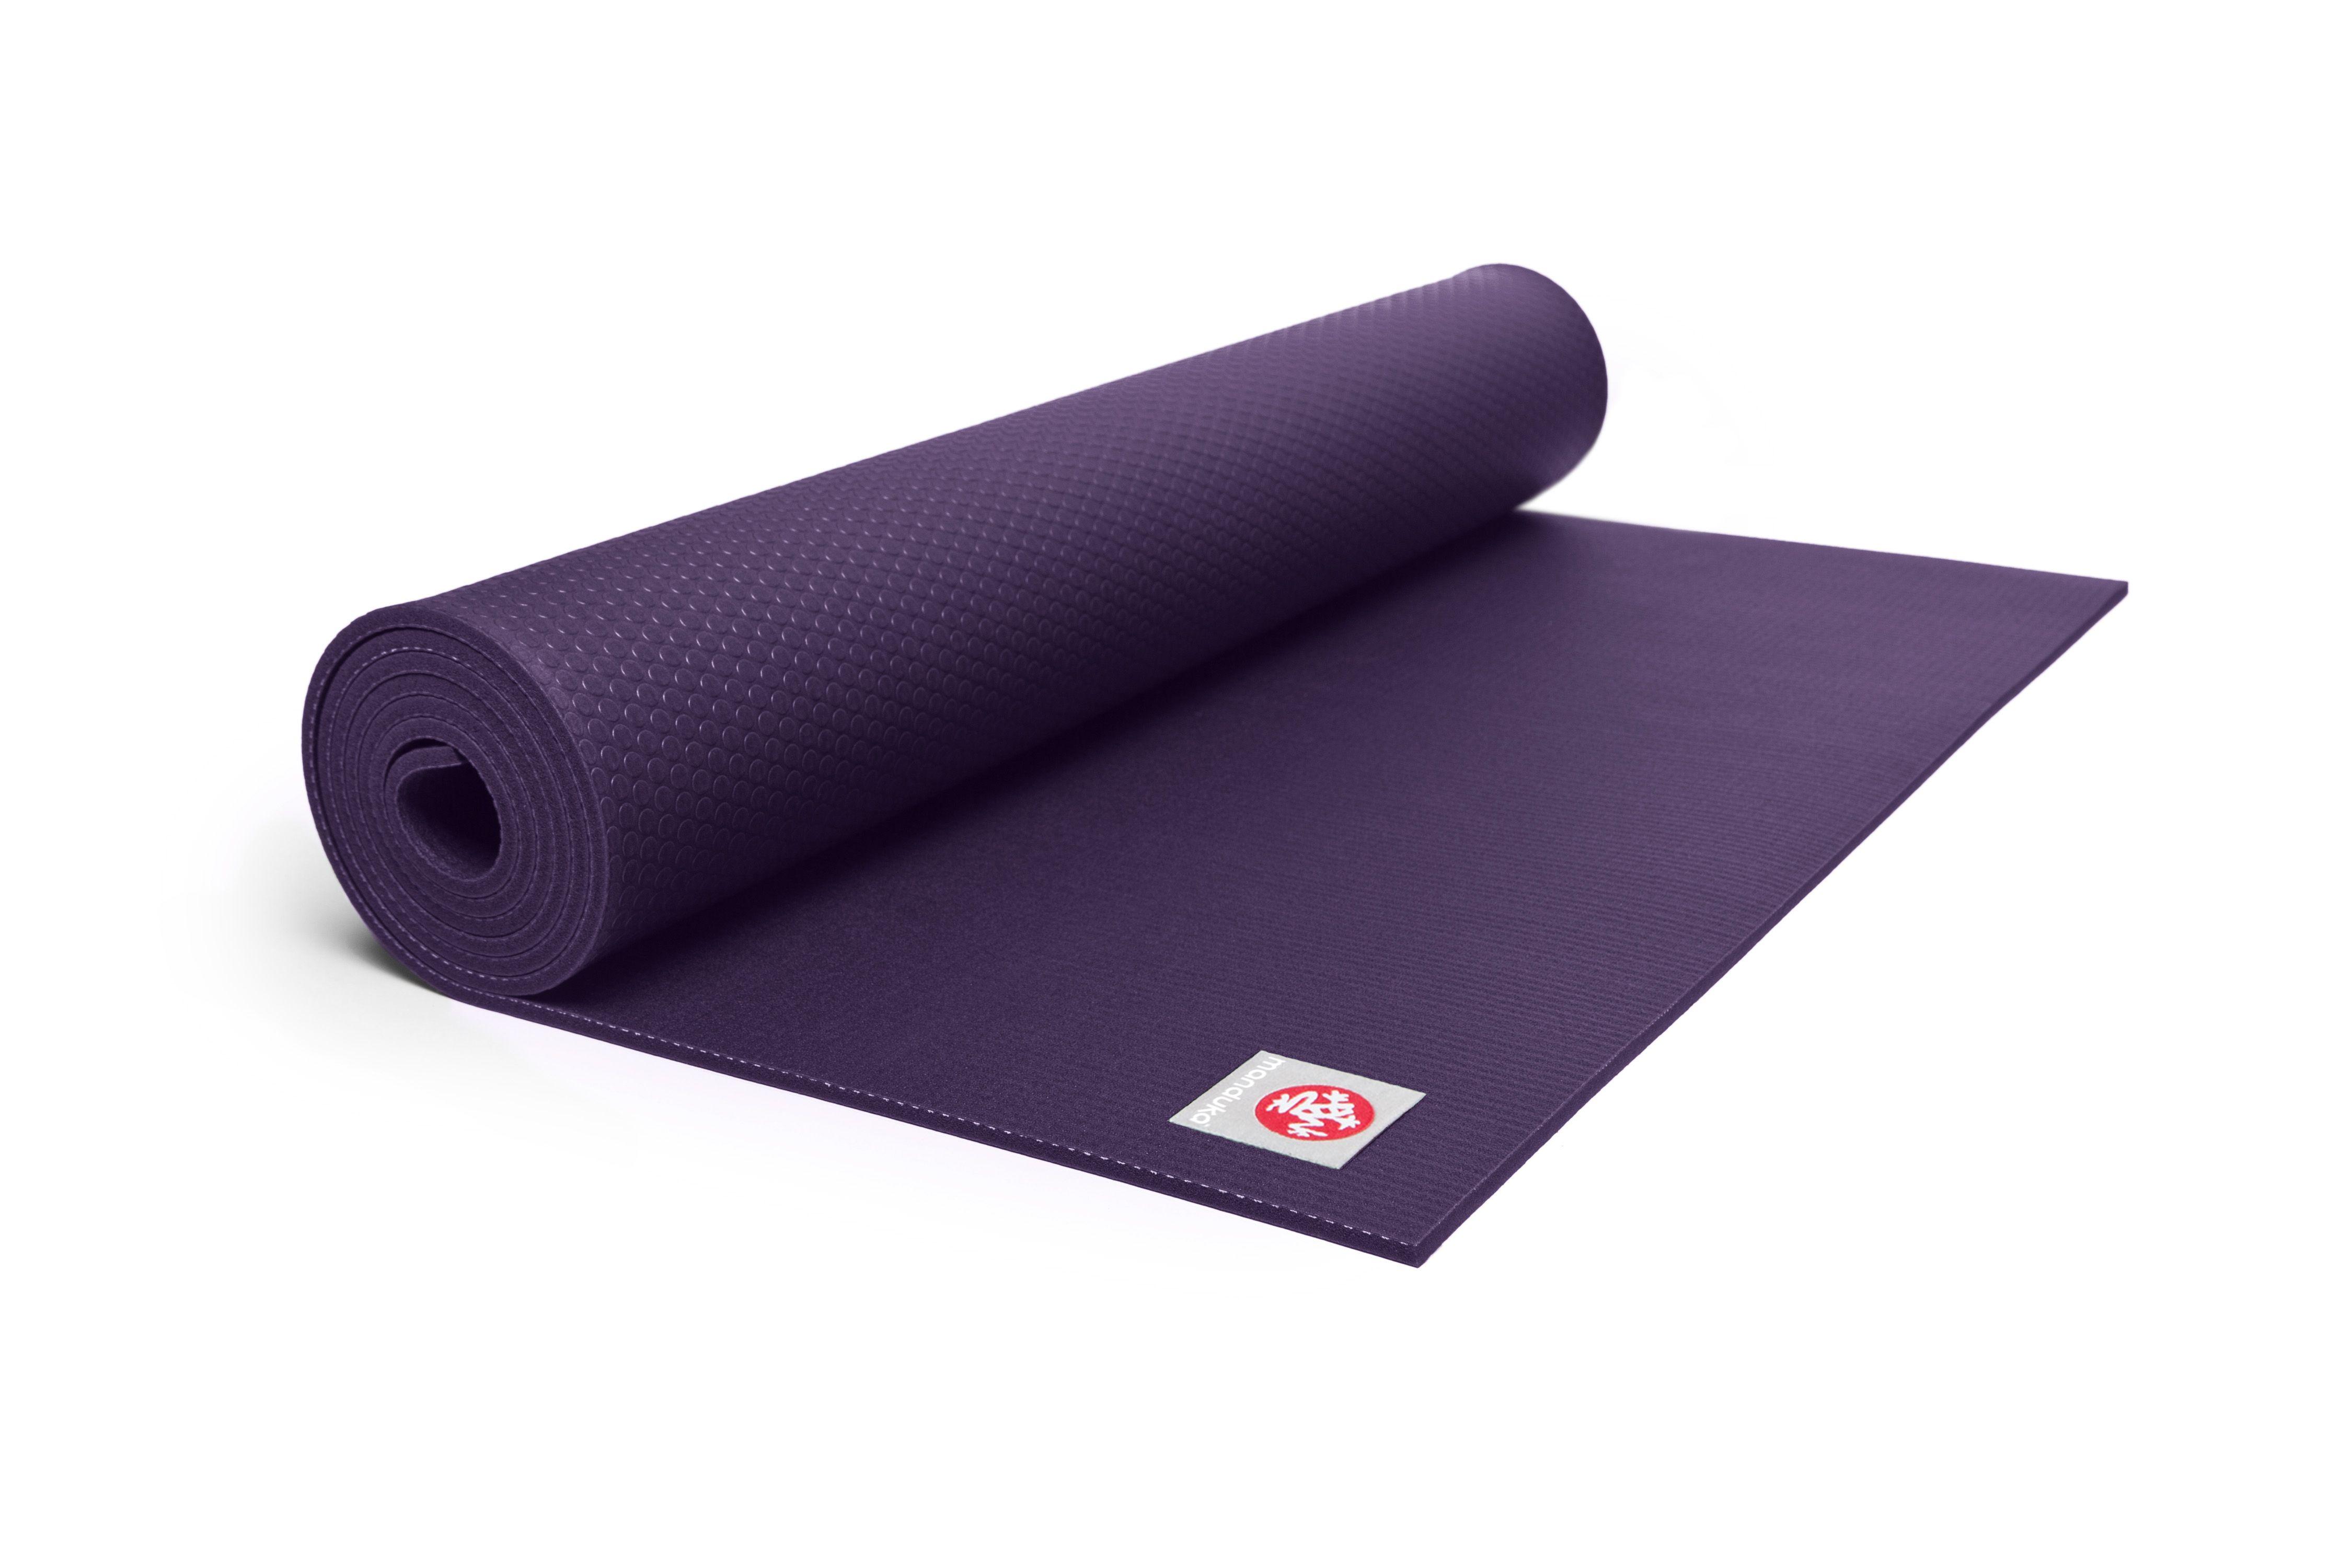 manduka mat prolite one yoga size professional binda pin jade mats unisex harmony amazon sports com